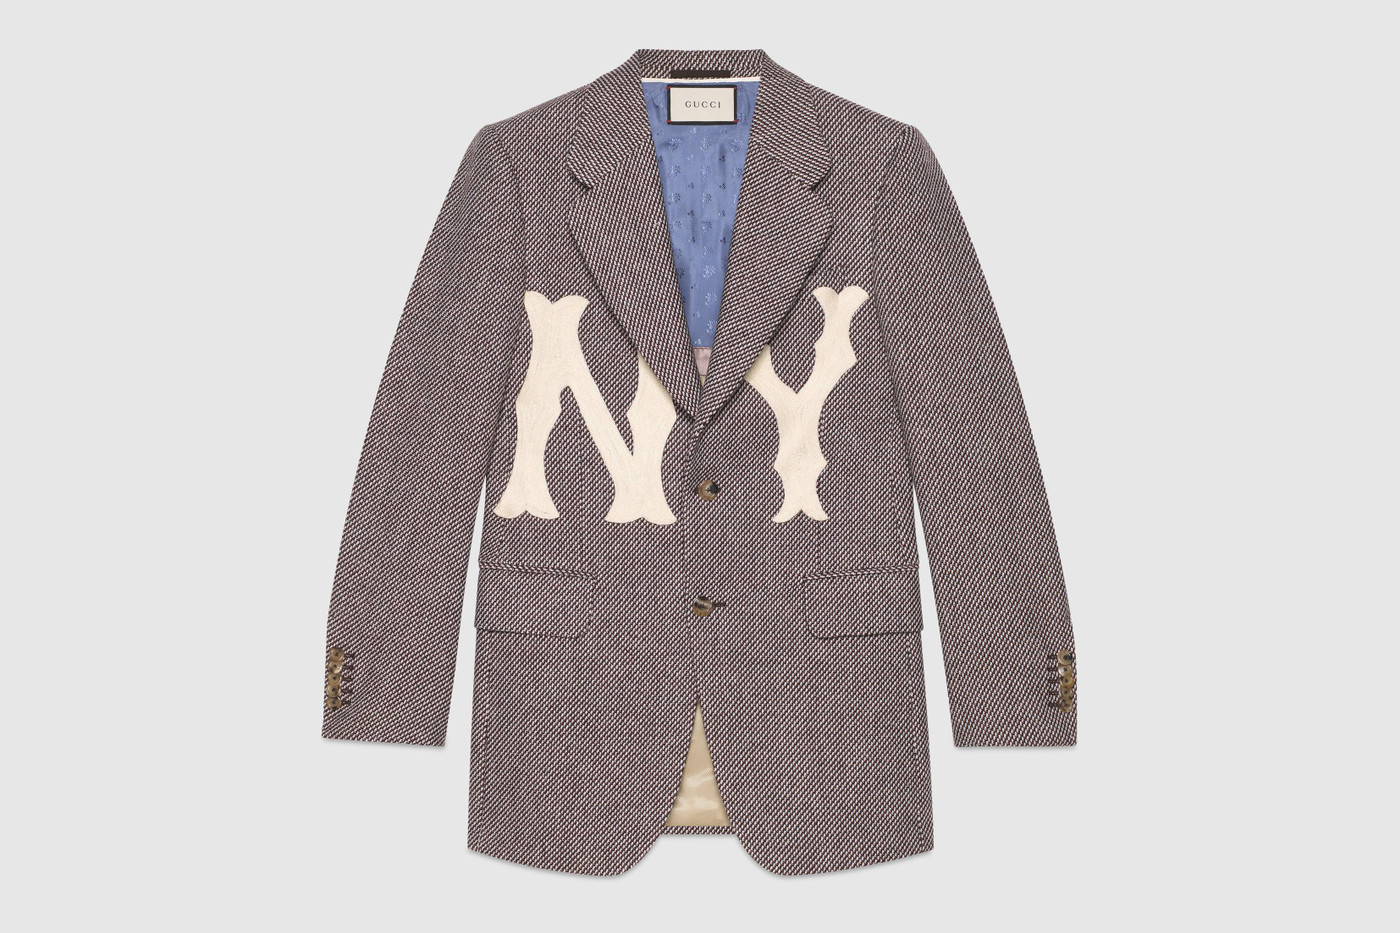 yankees-gucci-apparel-5 – Copy